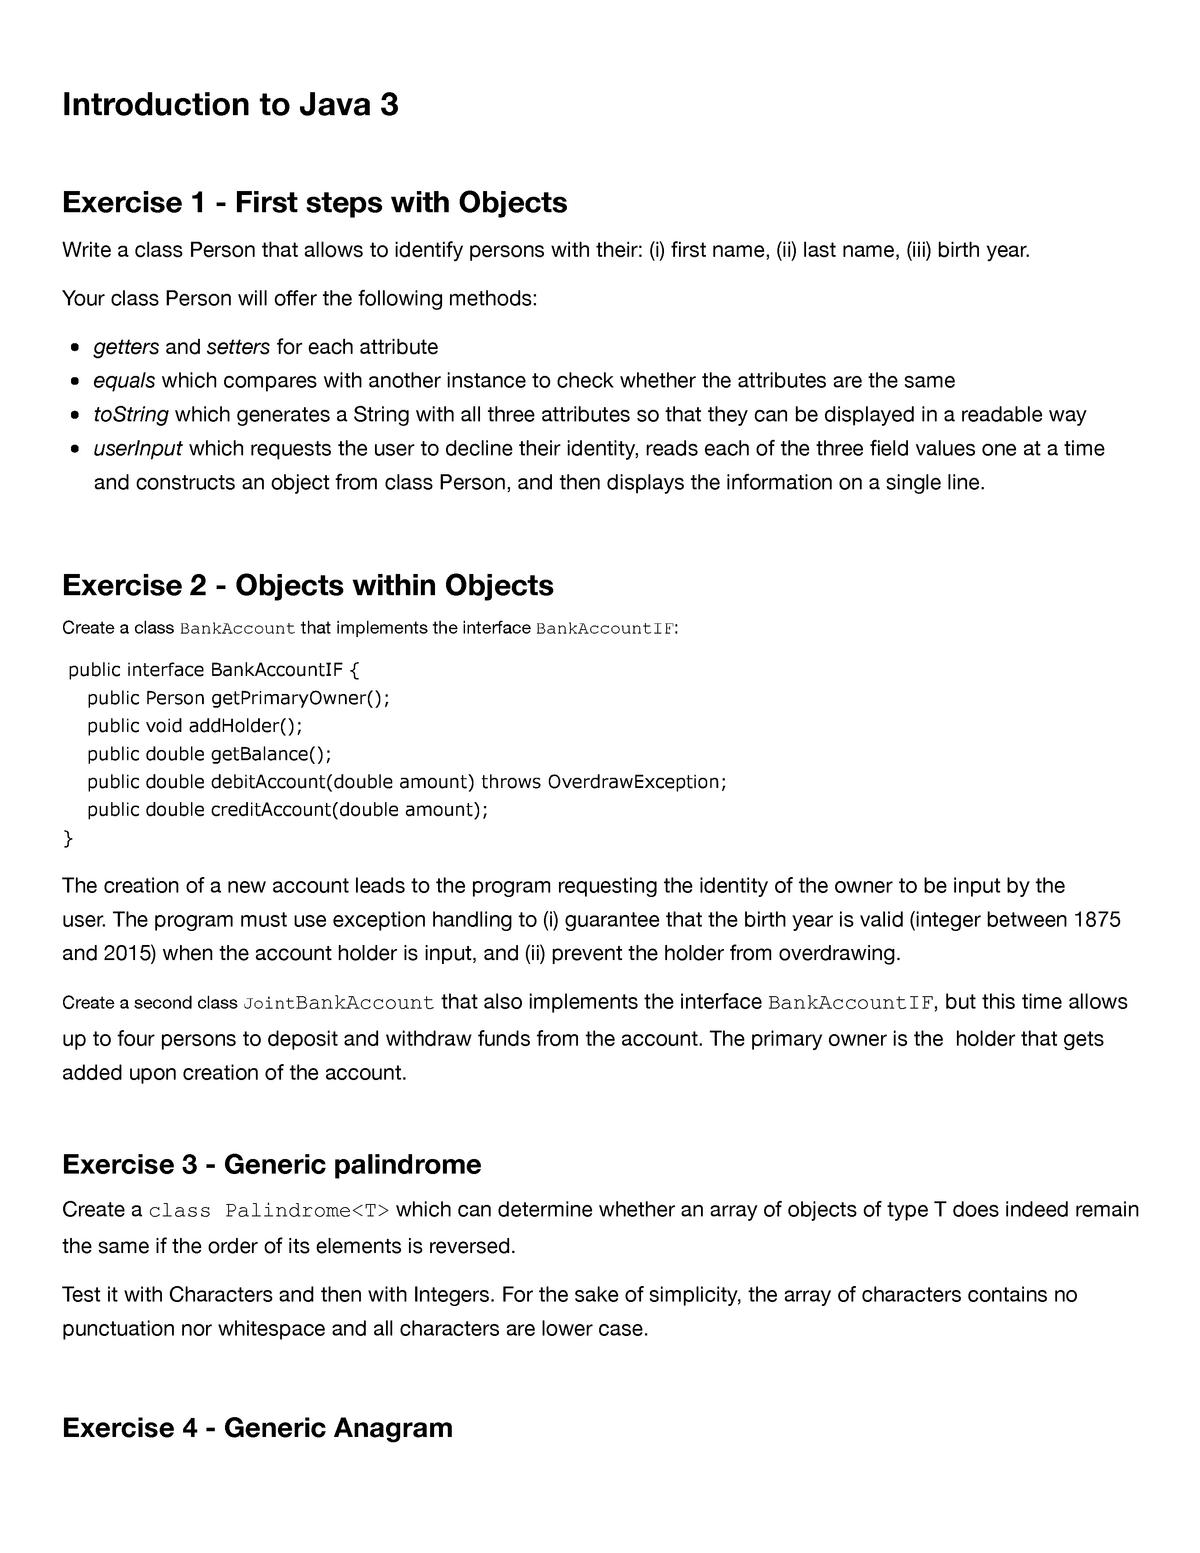 03 - Java Hands-On Exercises 3 - CSCIUA102: Data Structures